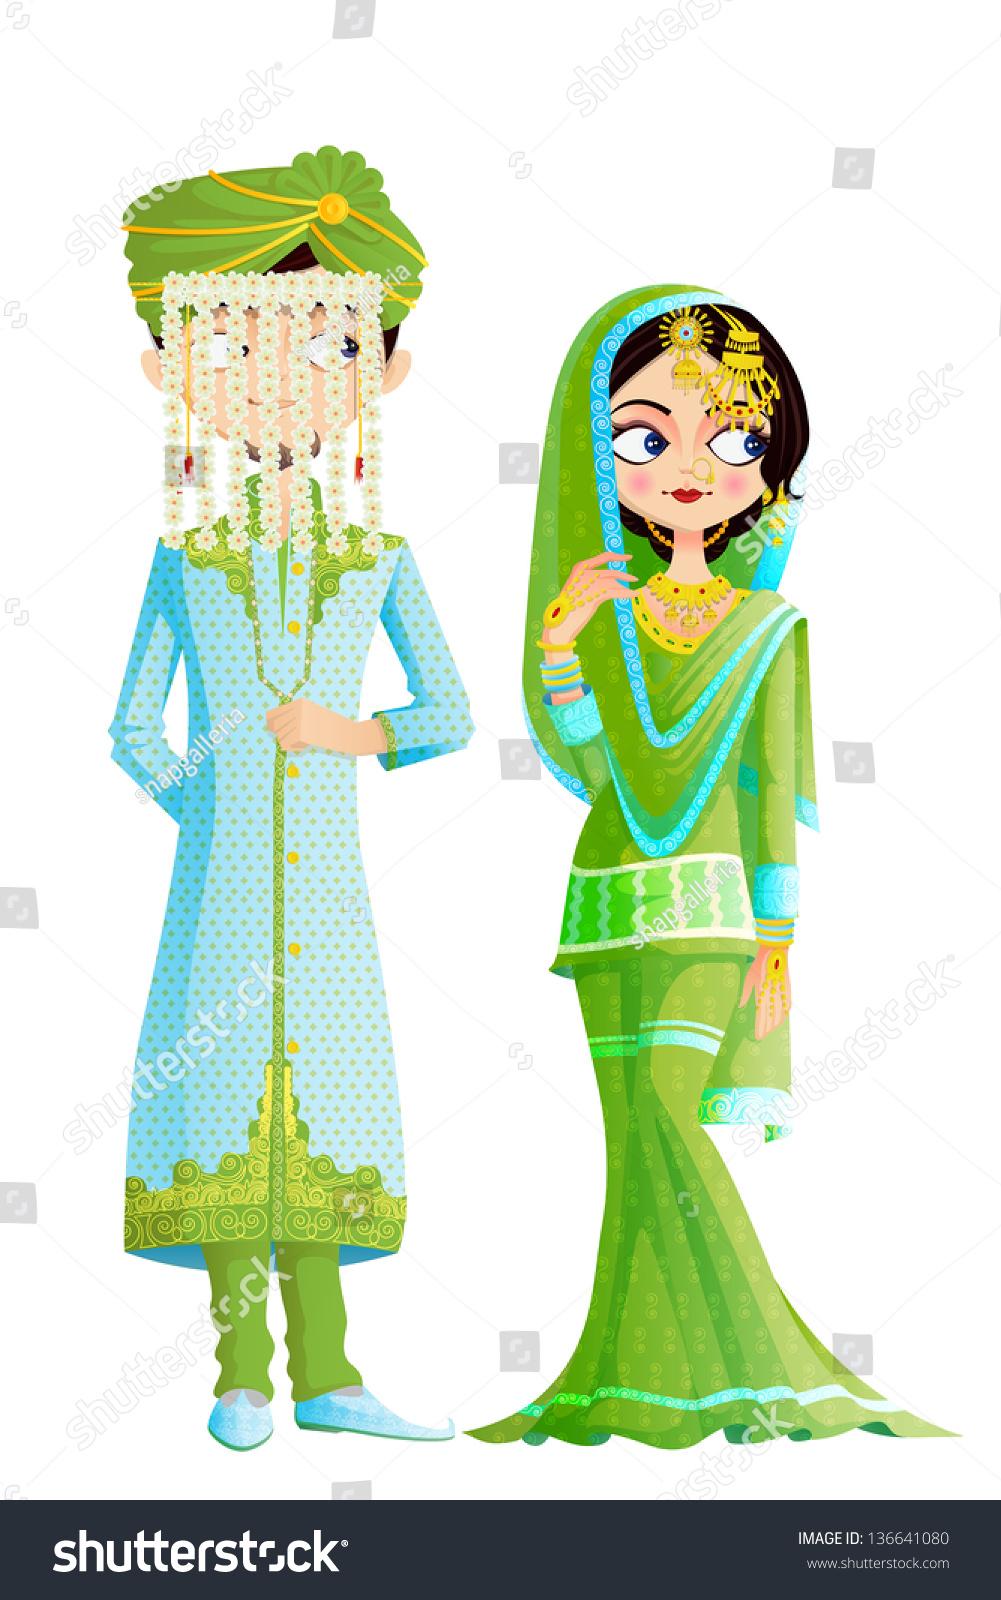 Easy Edit Vector Illustration Muslim Wedding Stock Vector